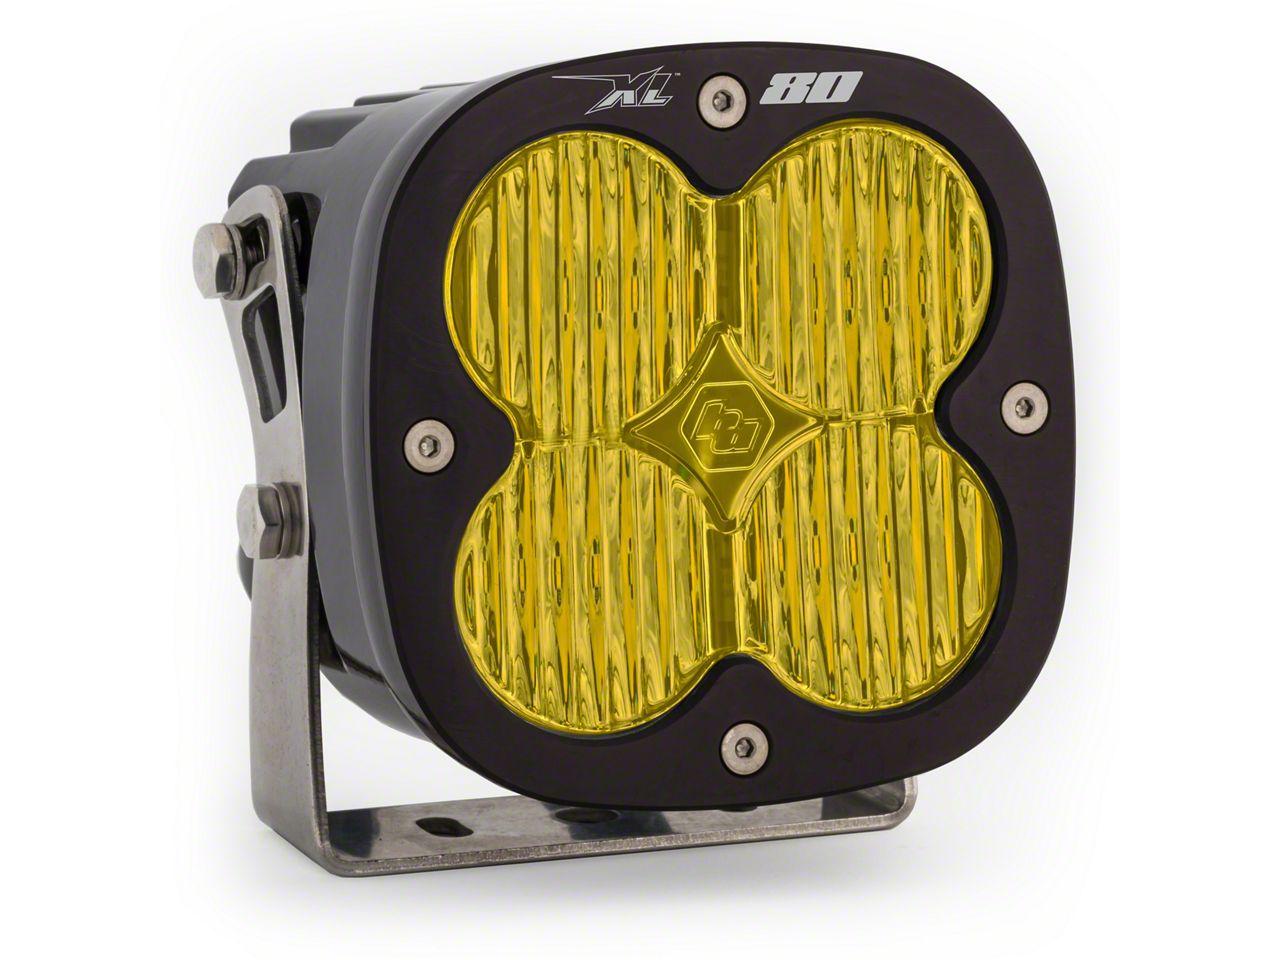 Baja Designs XL80 Amber LED Light - Wide Cornering Beam